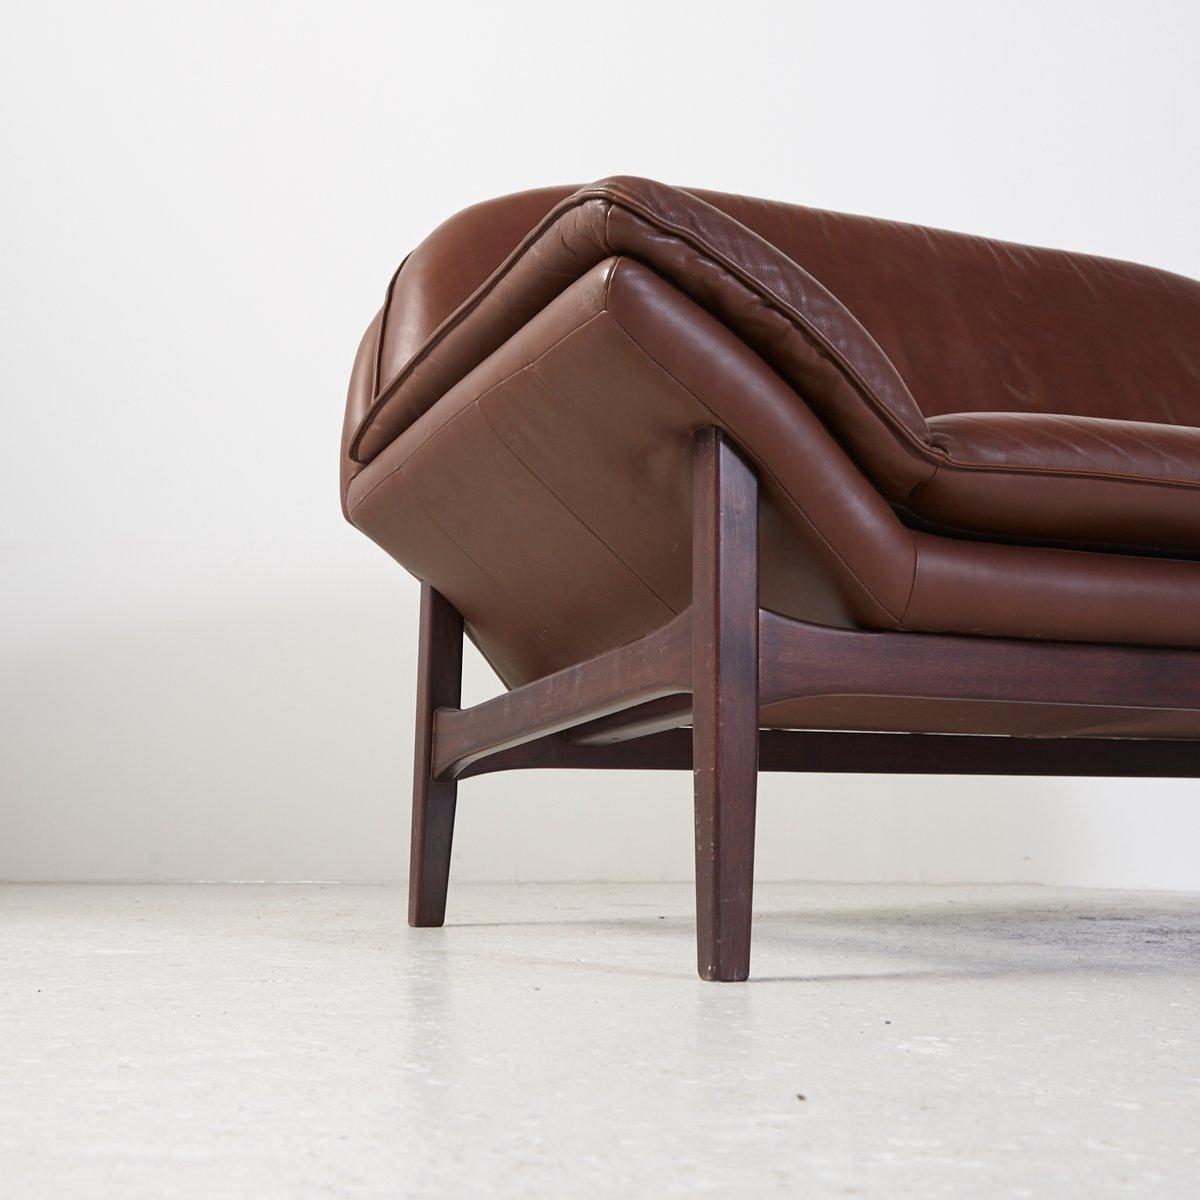 vintage 2 sitzer ledersofa bei pamono kaufen. Black Bedroom Furniture Sets. Home Design Ideas